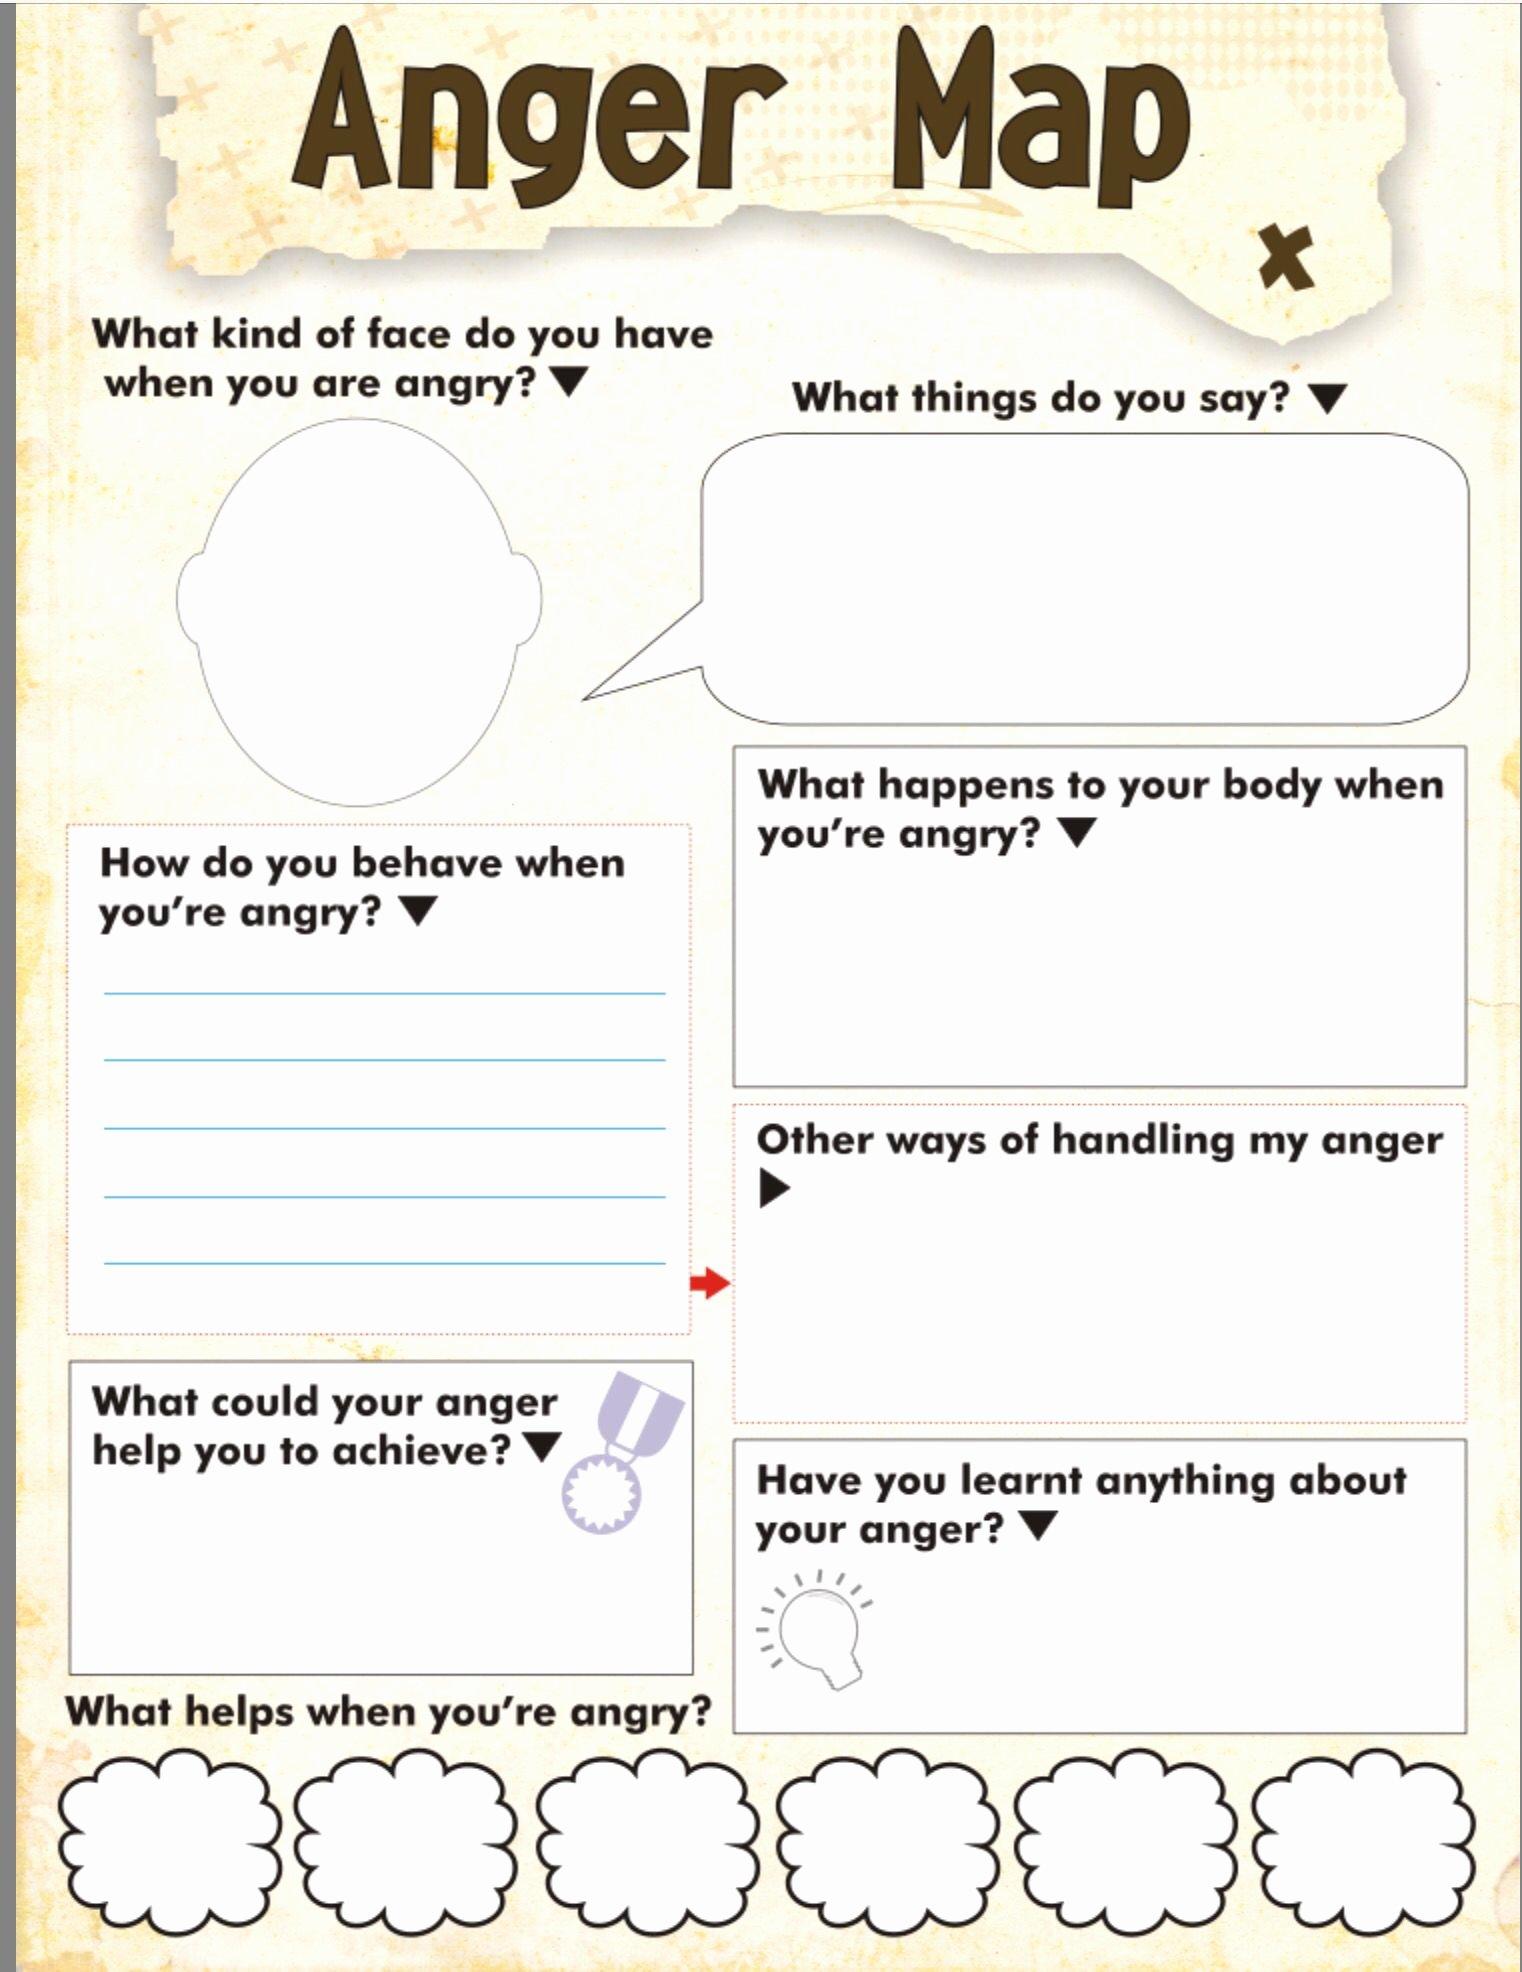 50 Anger Management Worksheet For Teenagers